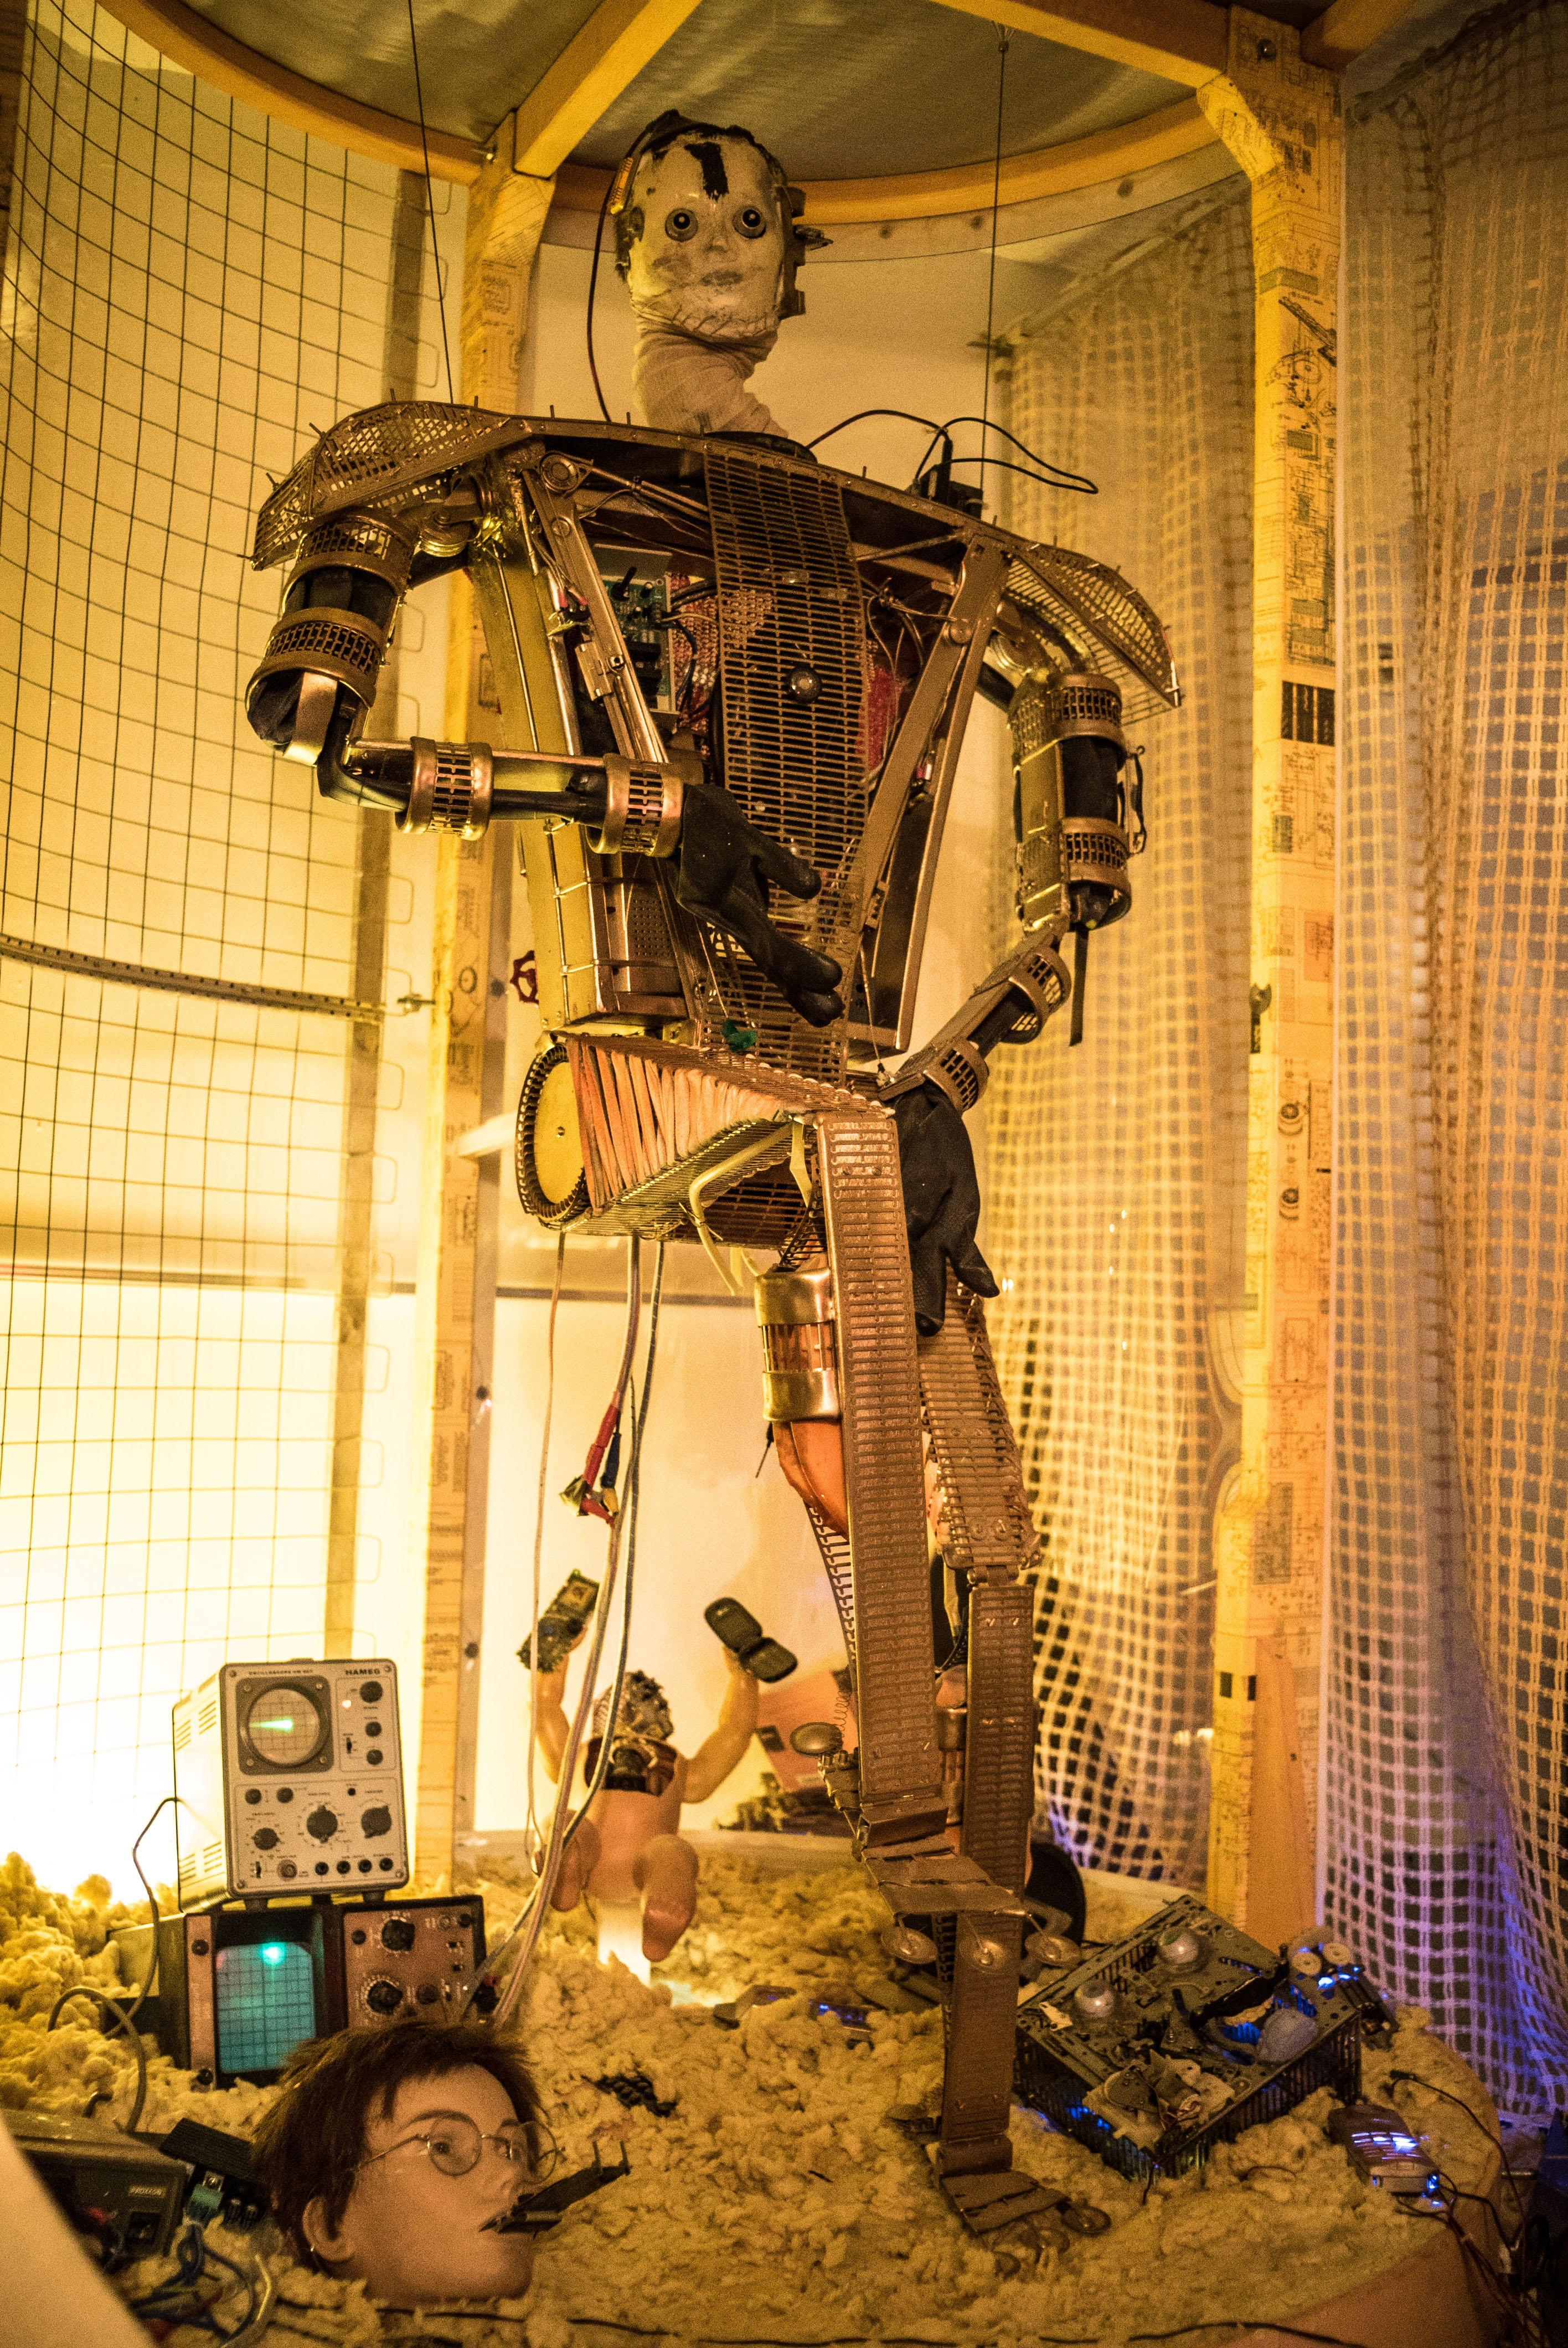 ExperimentRoboter.jpg